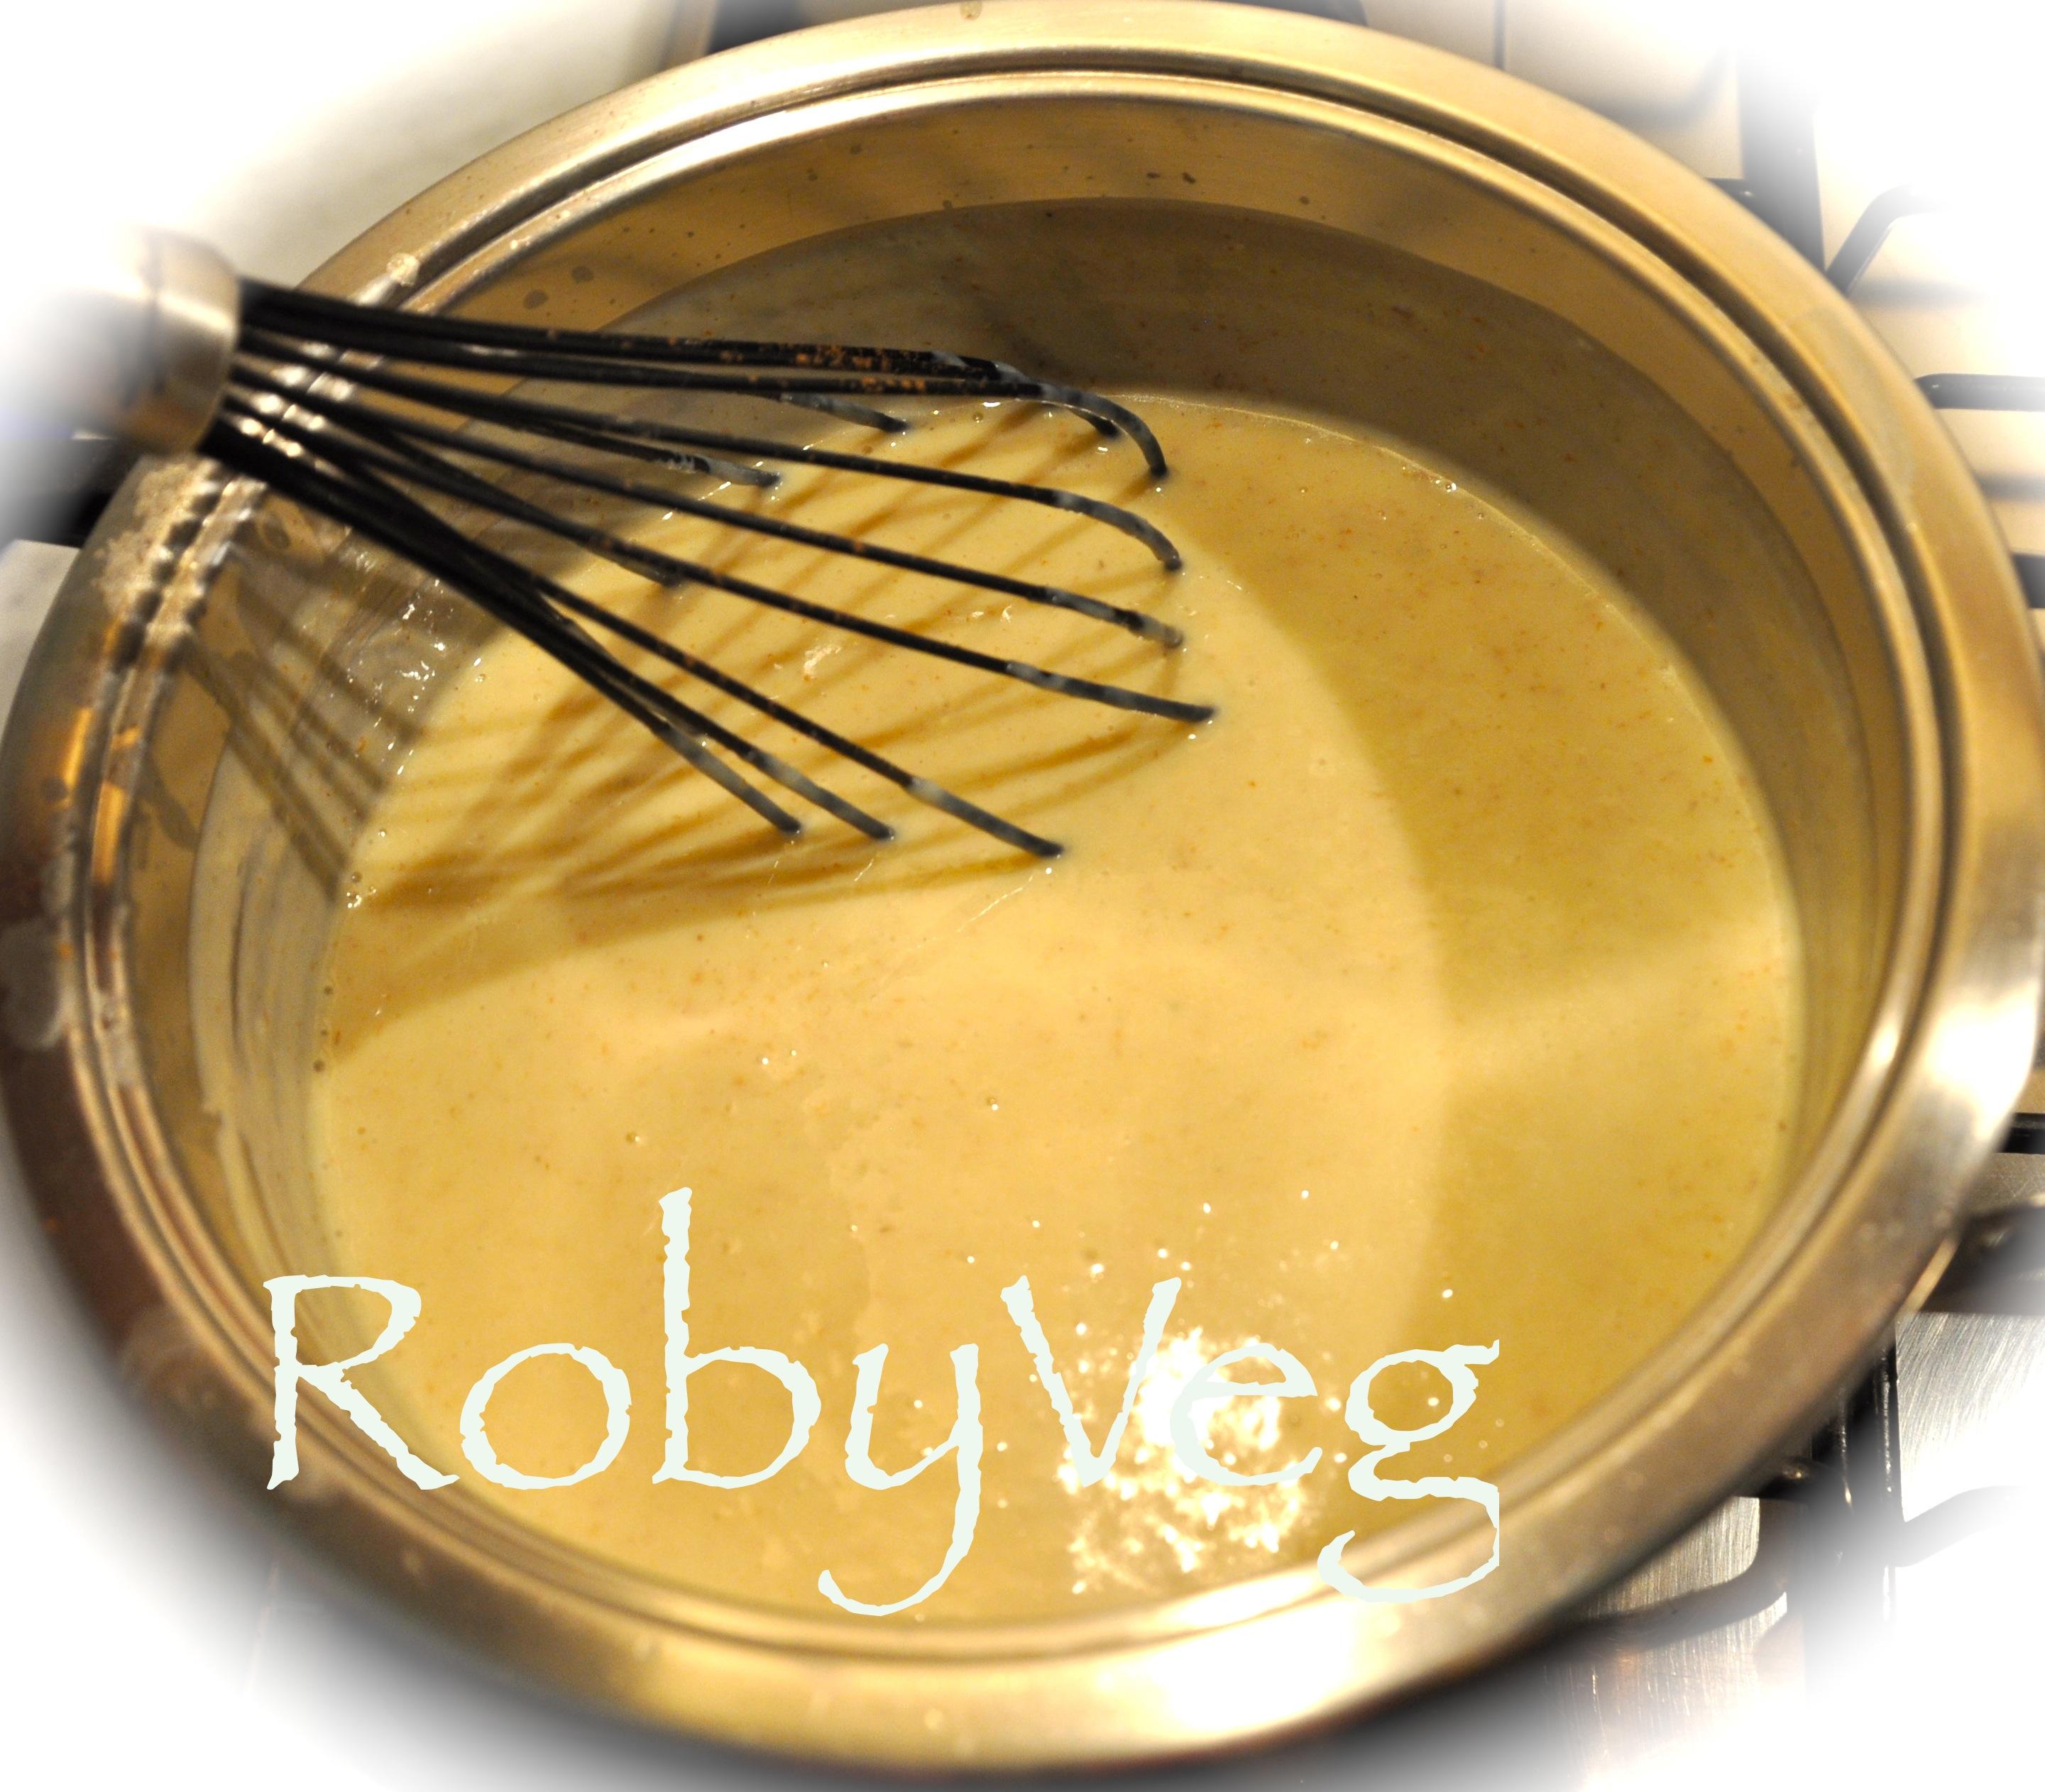 In Cucina Con Roberta  Cucina Naturale Vegan  Ricette